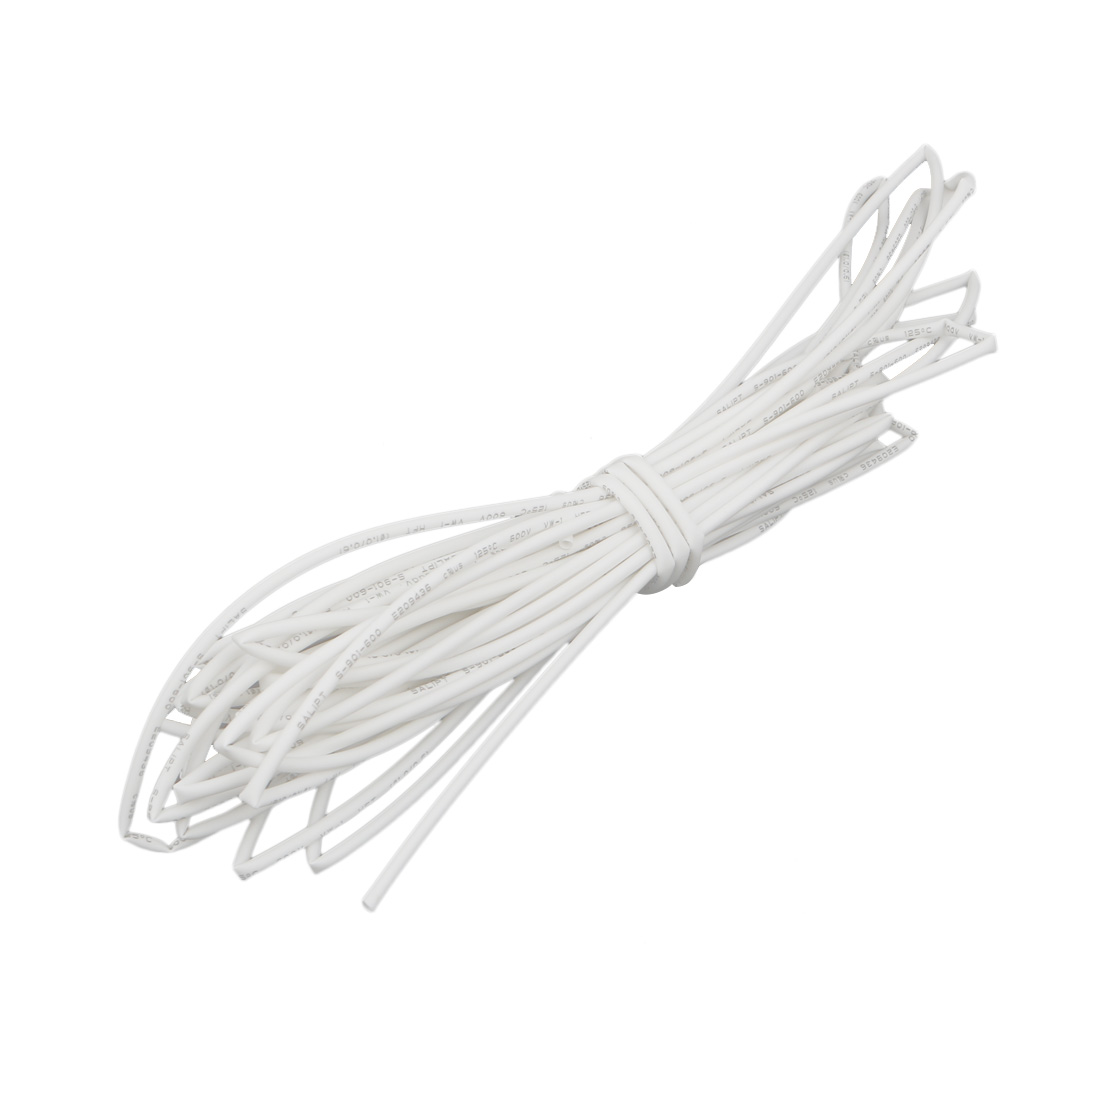 6M 0.04in Inner Dia Polyolefin Flame Retardant Tube White for Wire Repairing